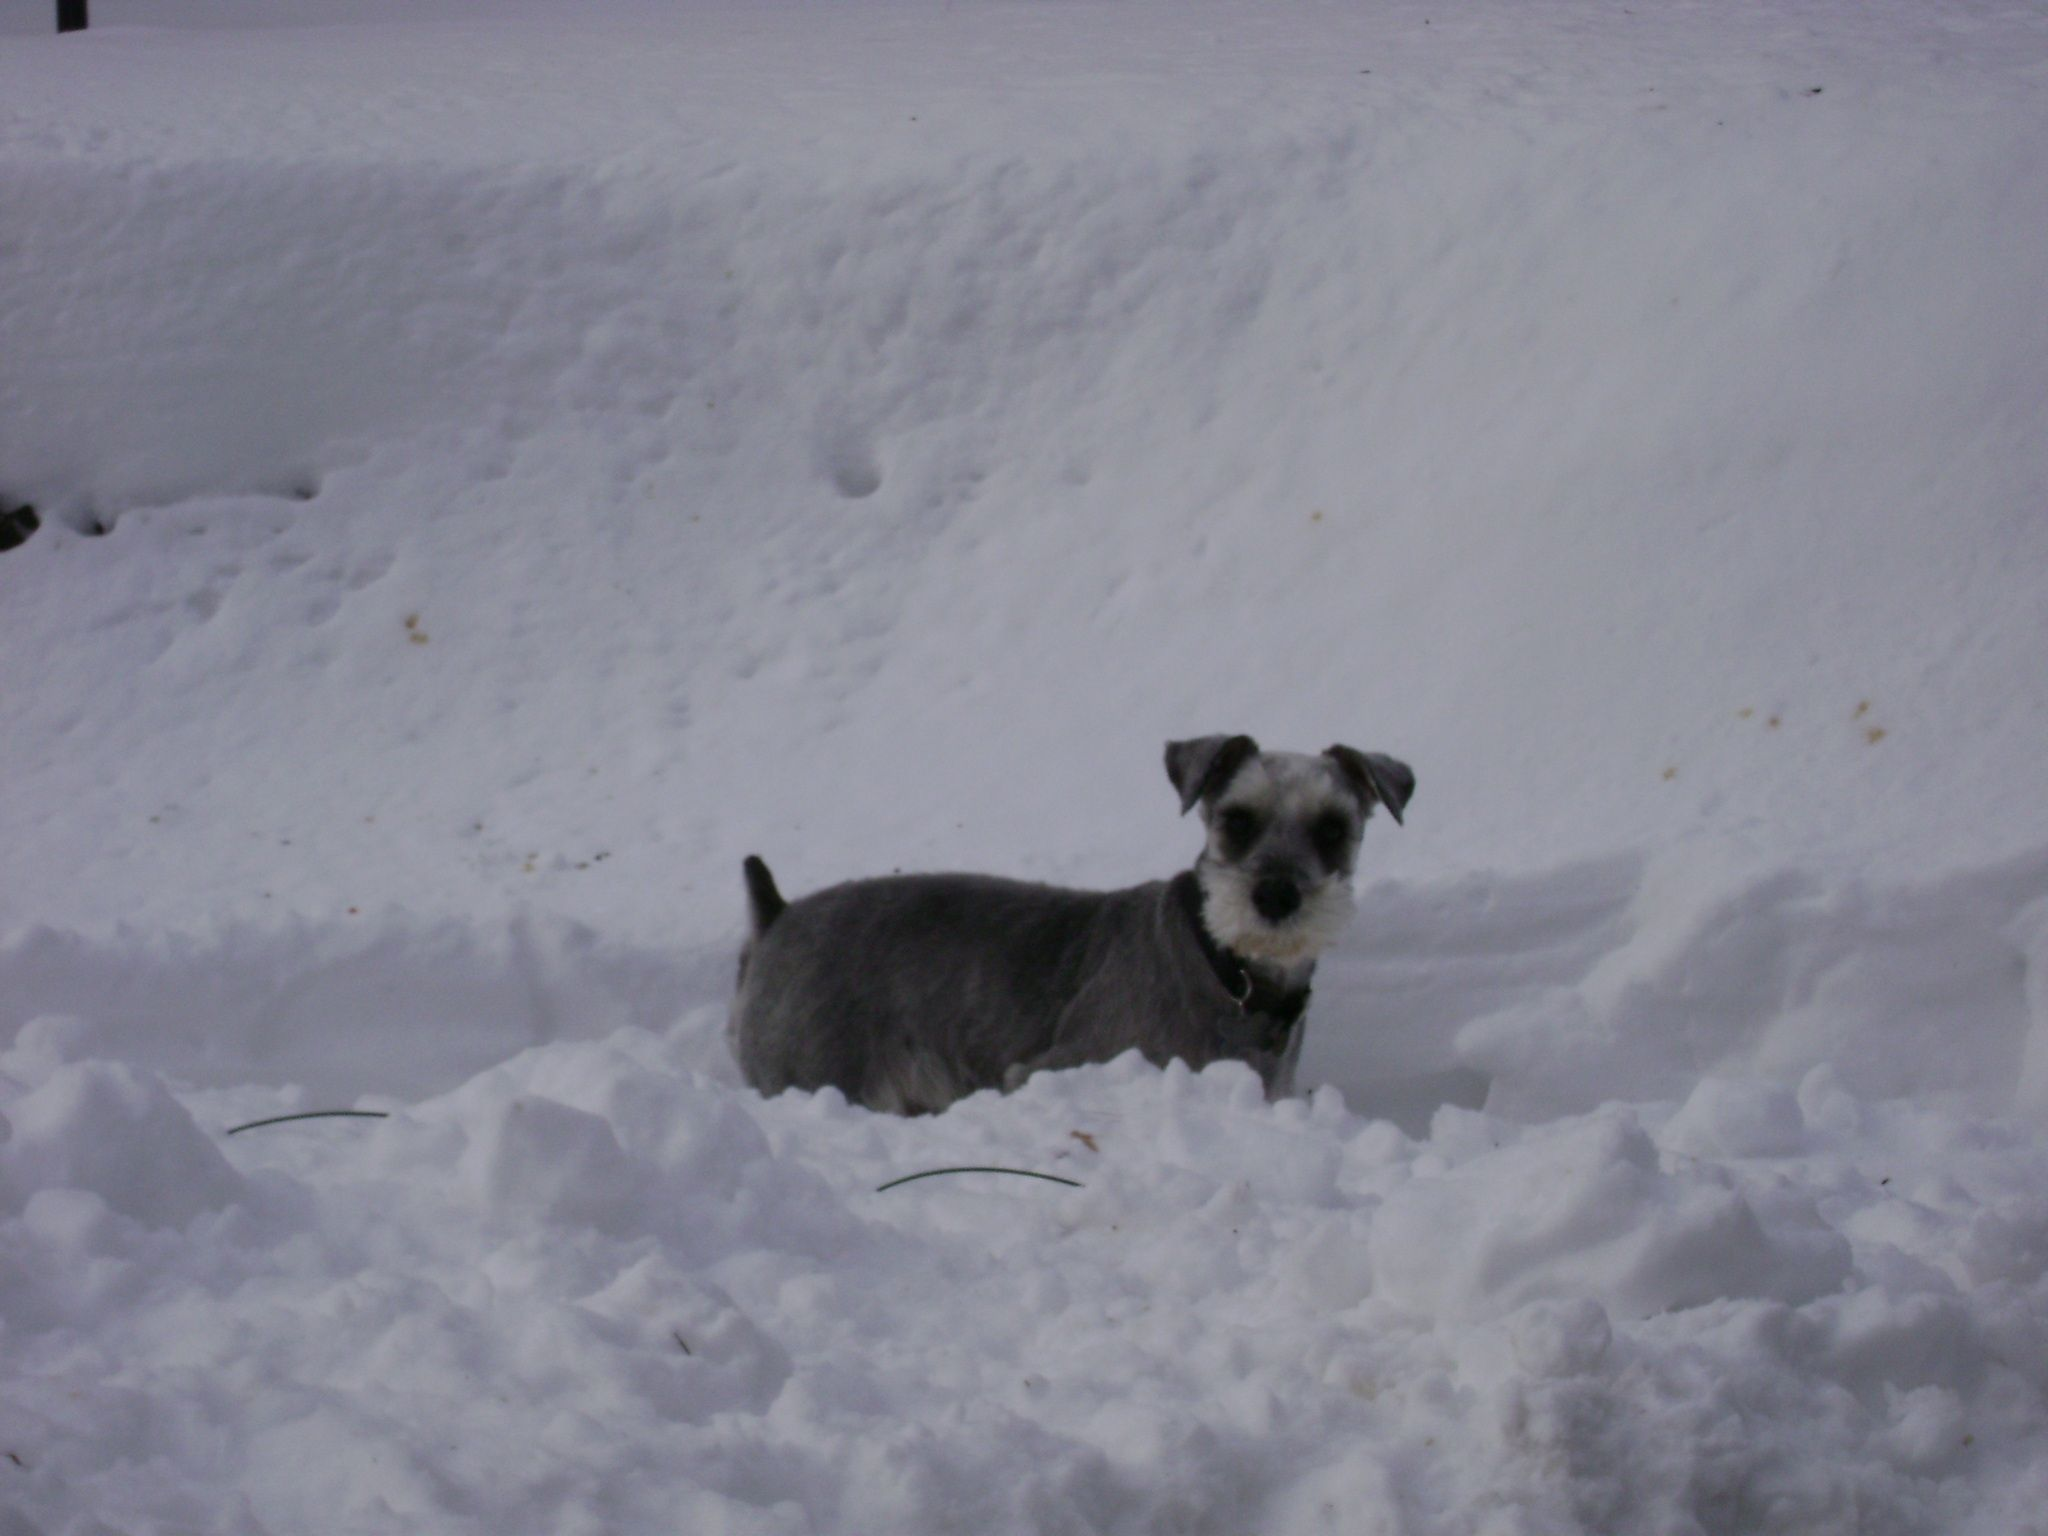 The Snow Schnauzer